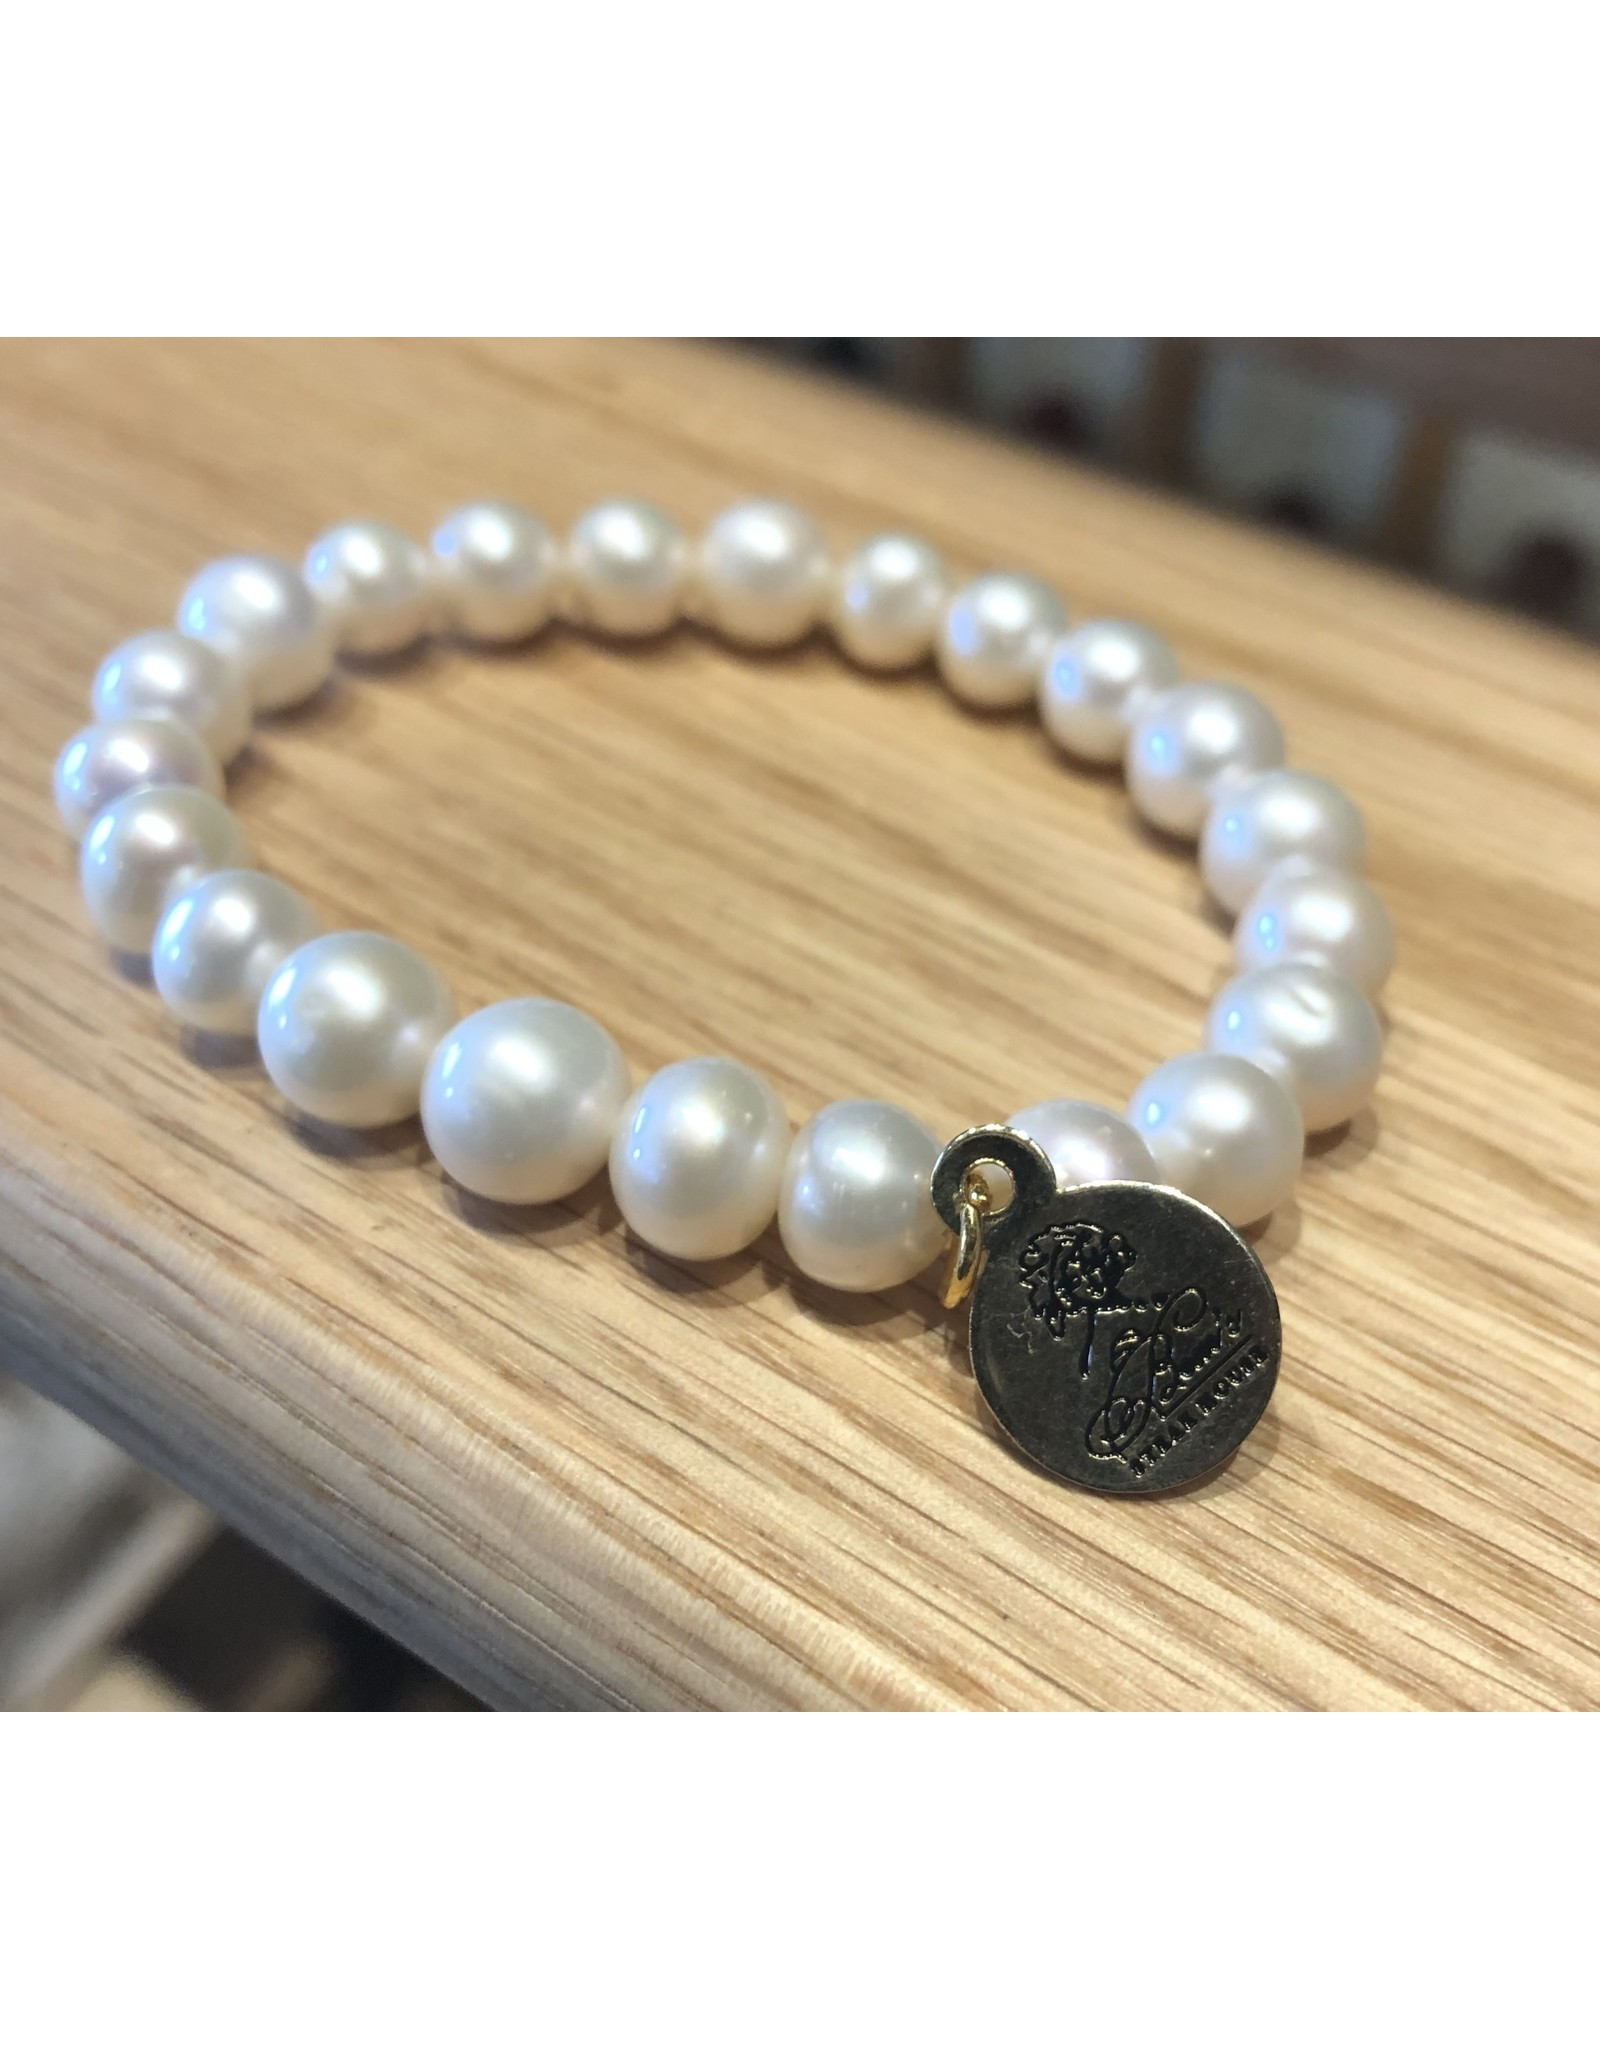 Bern's Evangeline White Pearl Bracelet